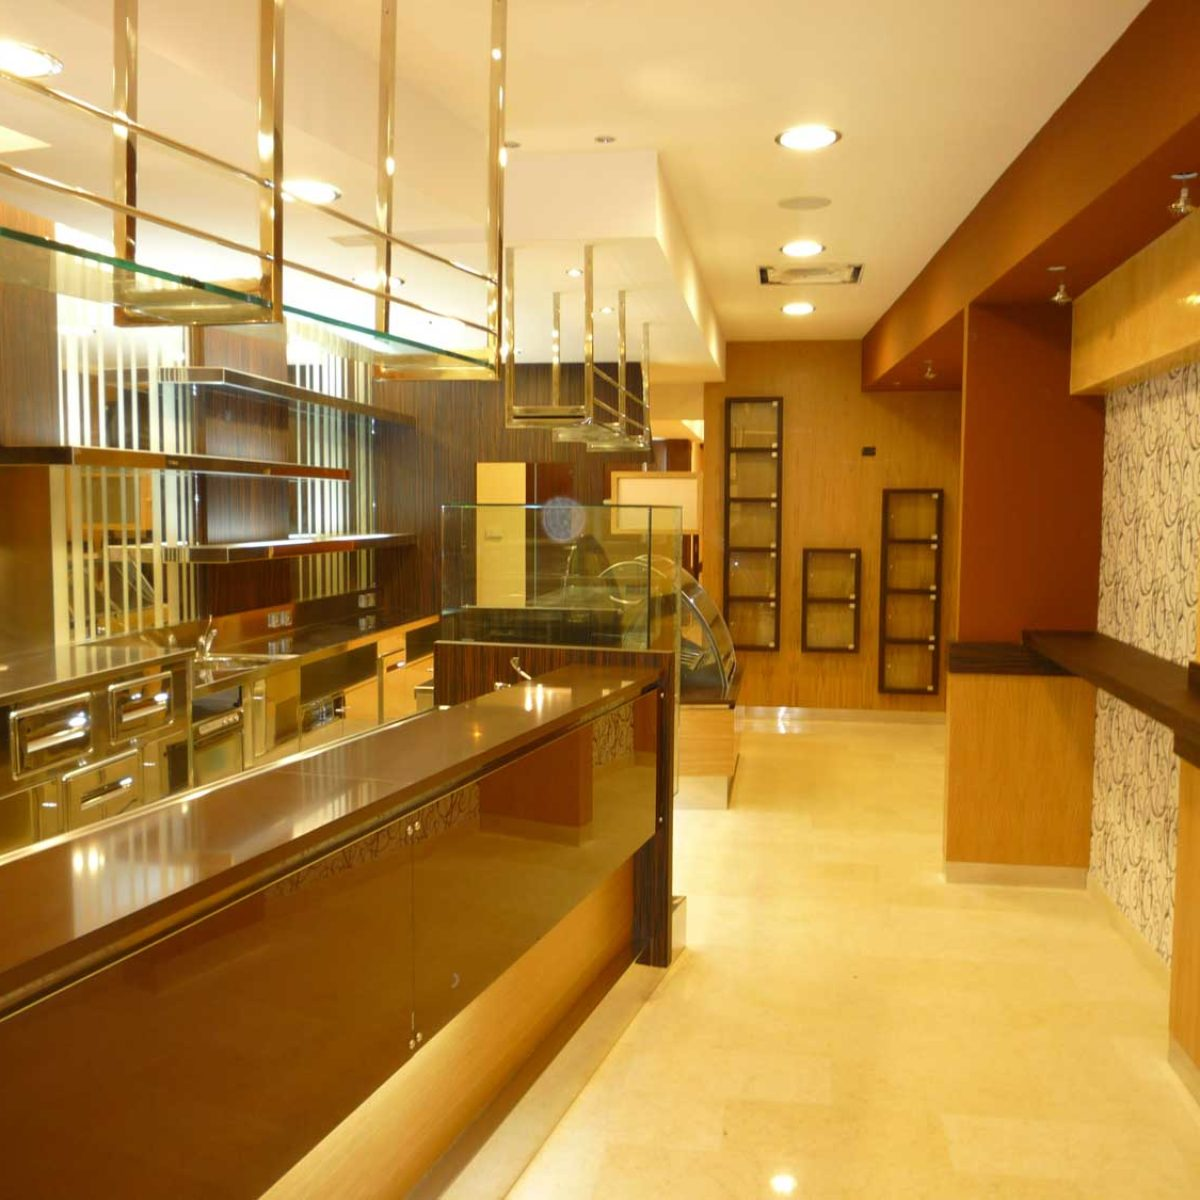 Bar pastry shop-ice cream shop